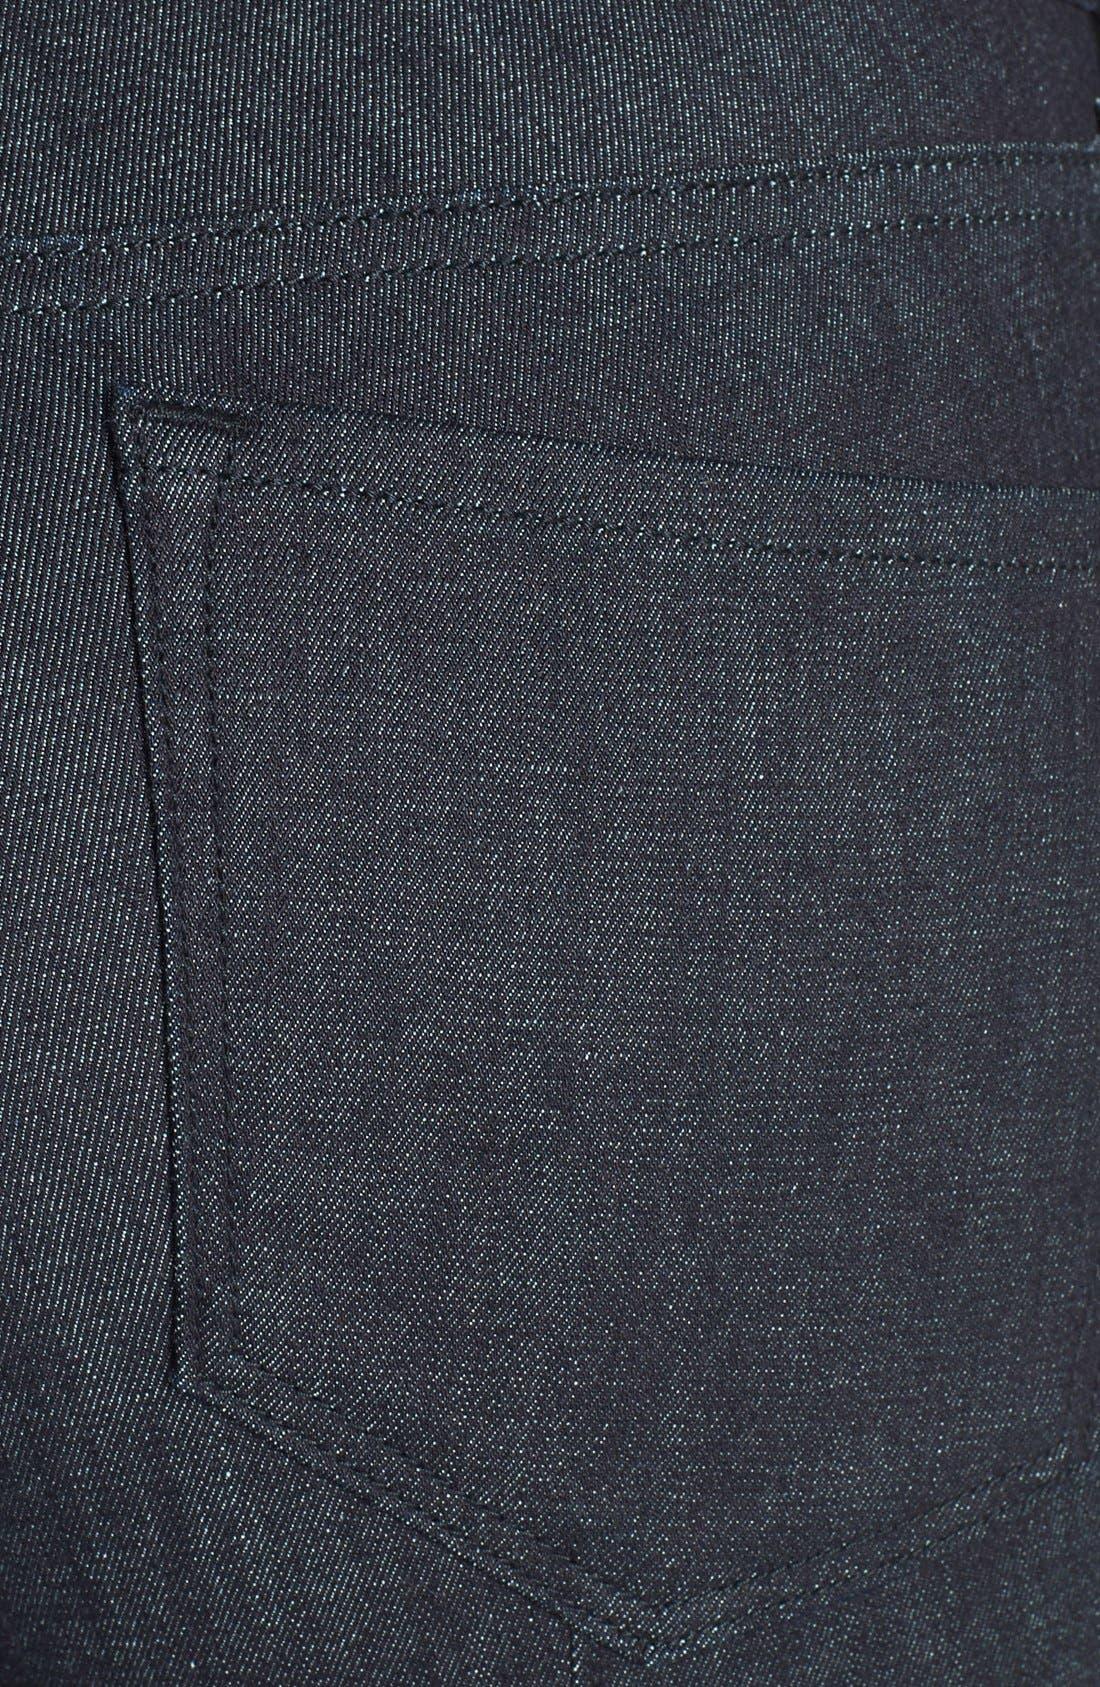 Alternate Image 3  - MARC BY MARC JACOBS Seamed Stretch Crop Cigarette Leg Jeans